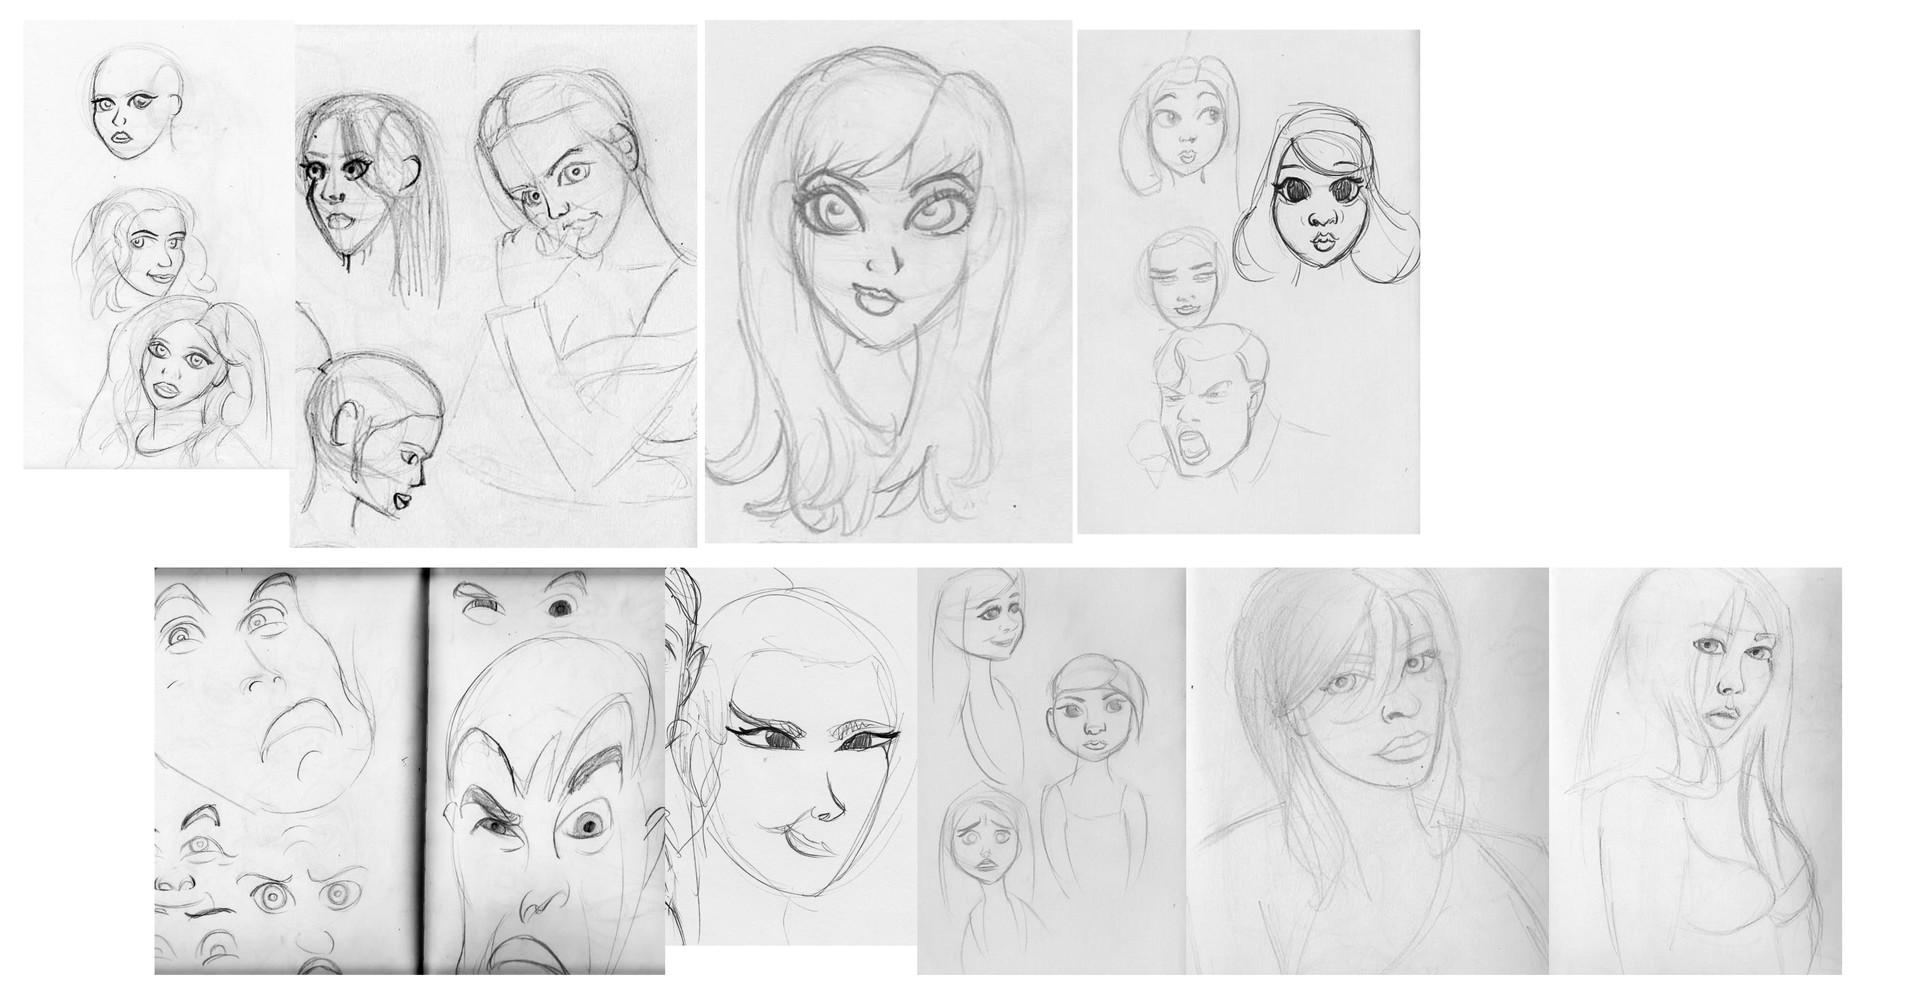 Andrew price collage 4